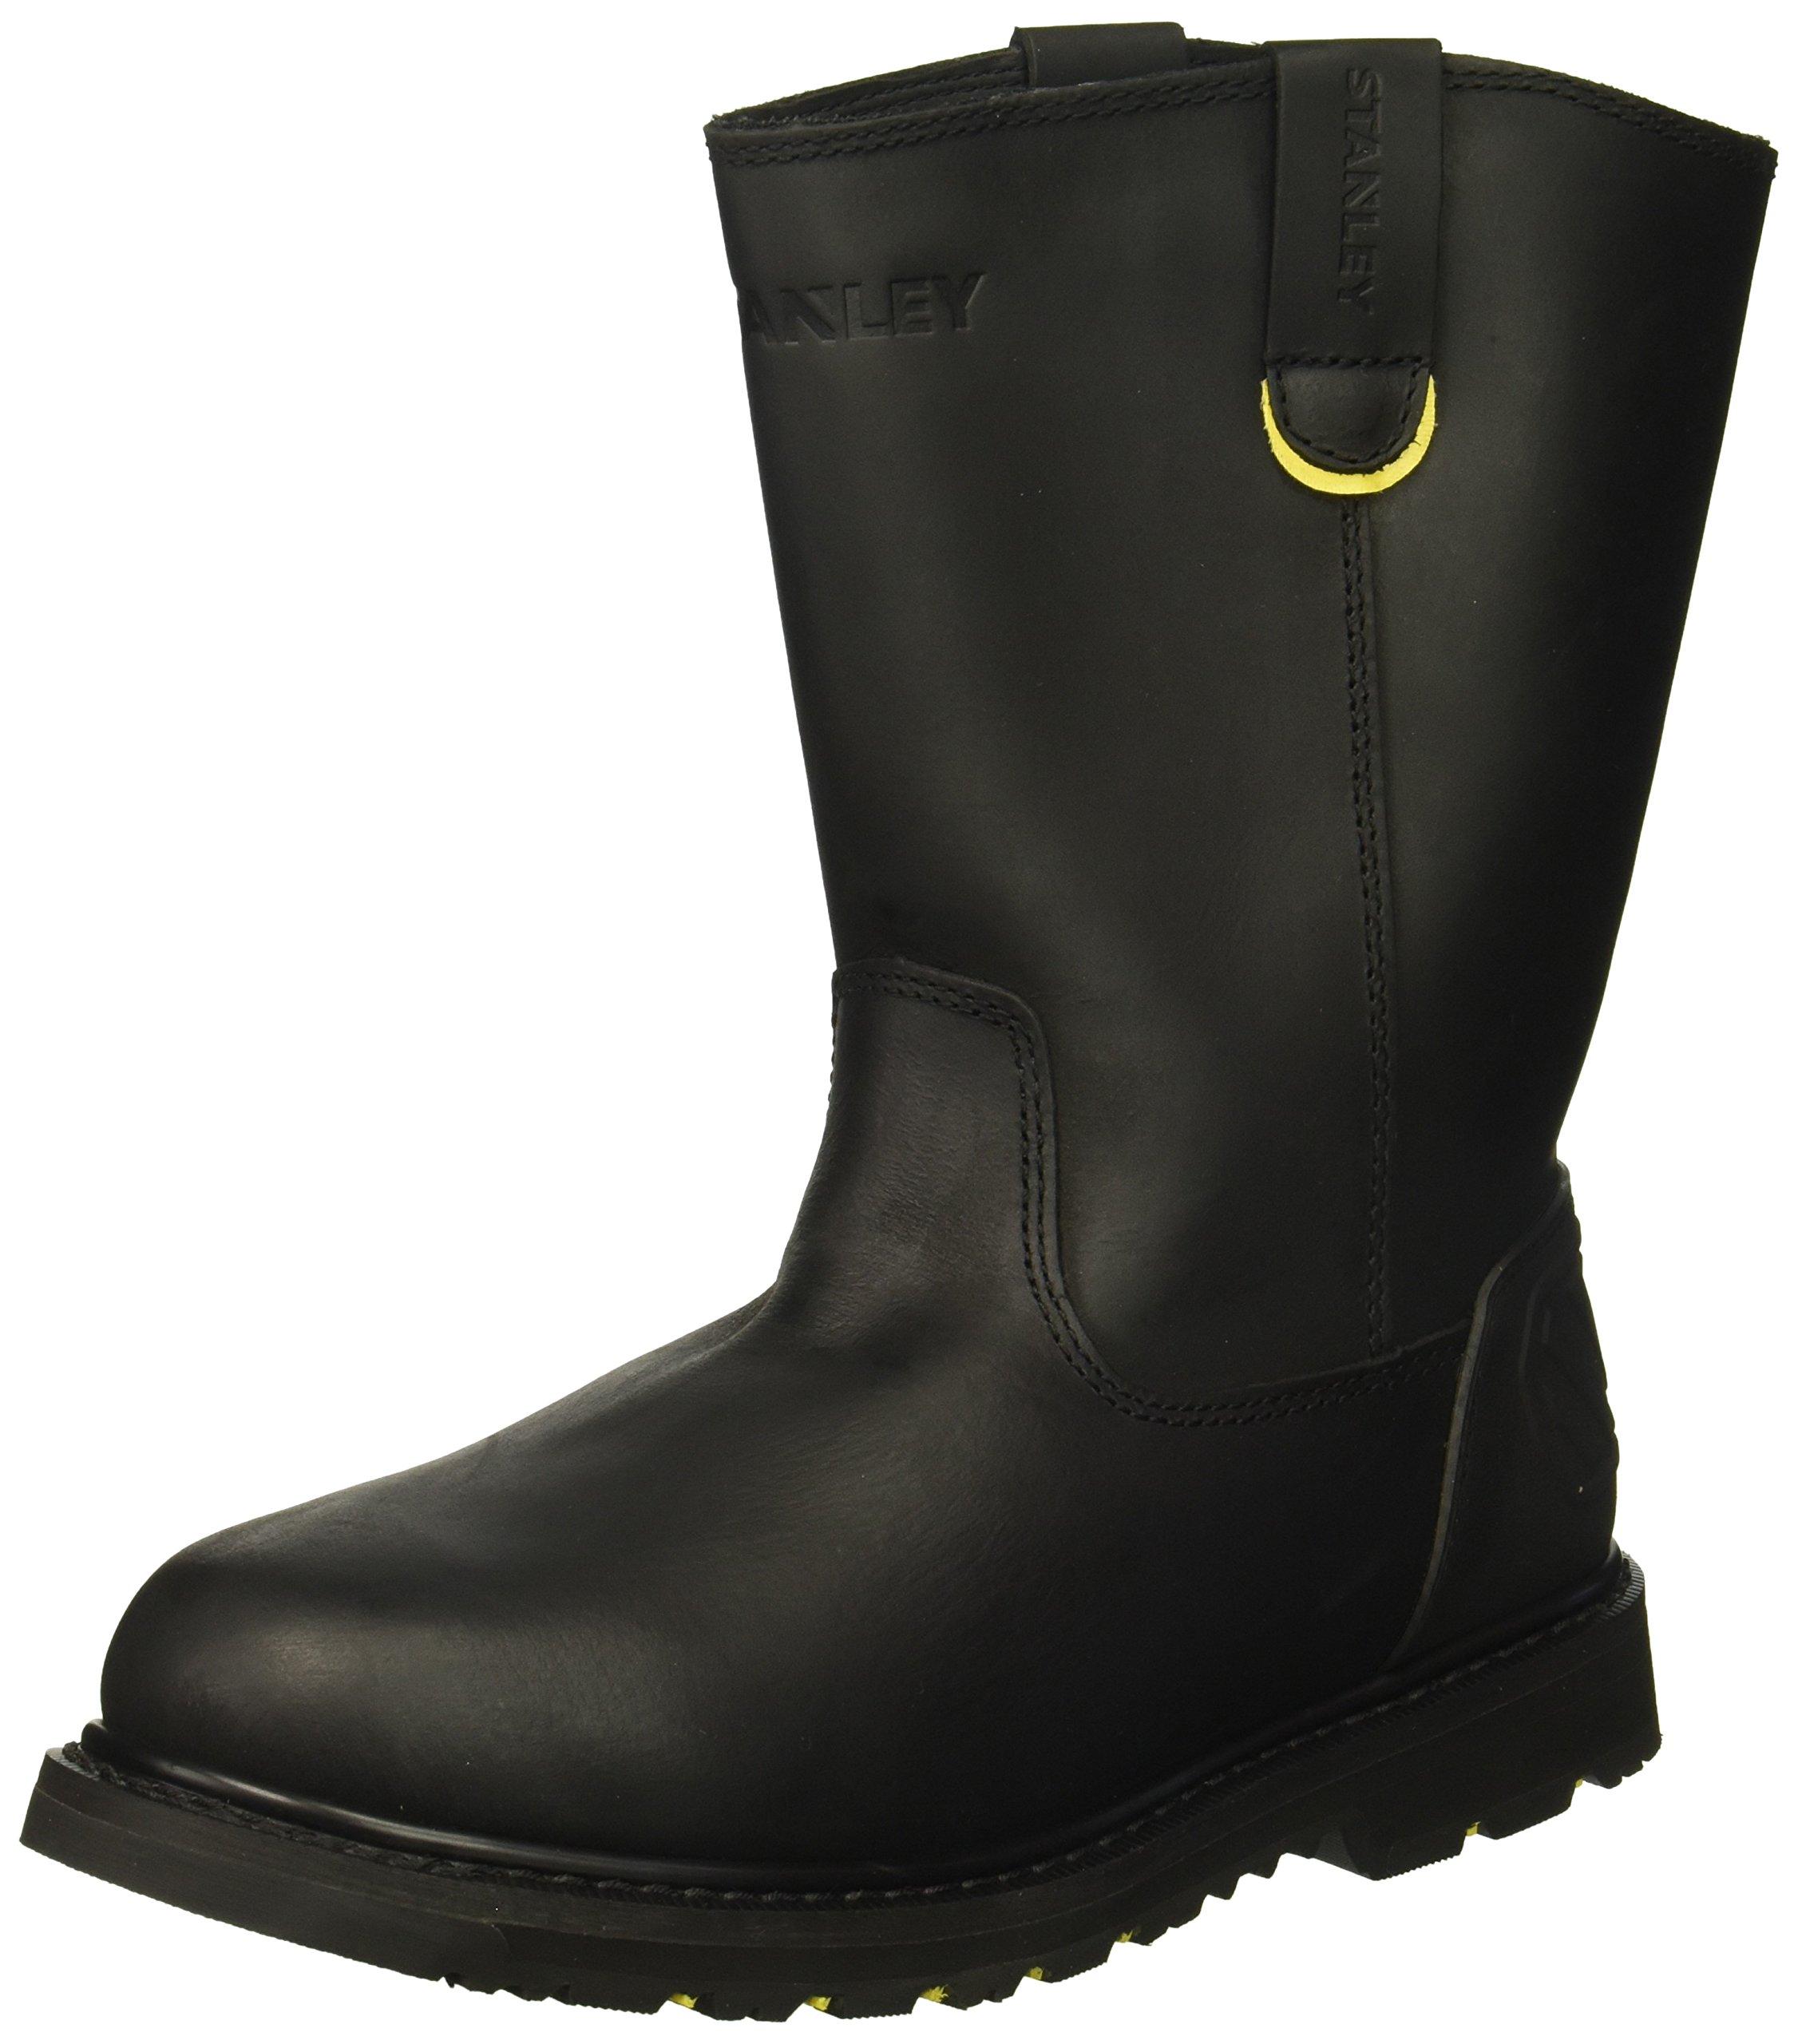 Stanley Men's Dropper 2.0 Soft Toe Industrial and Construction Shoe, Black, 10.5 M US